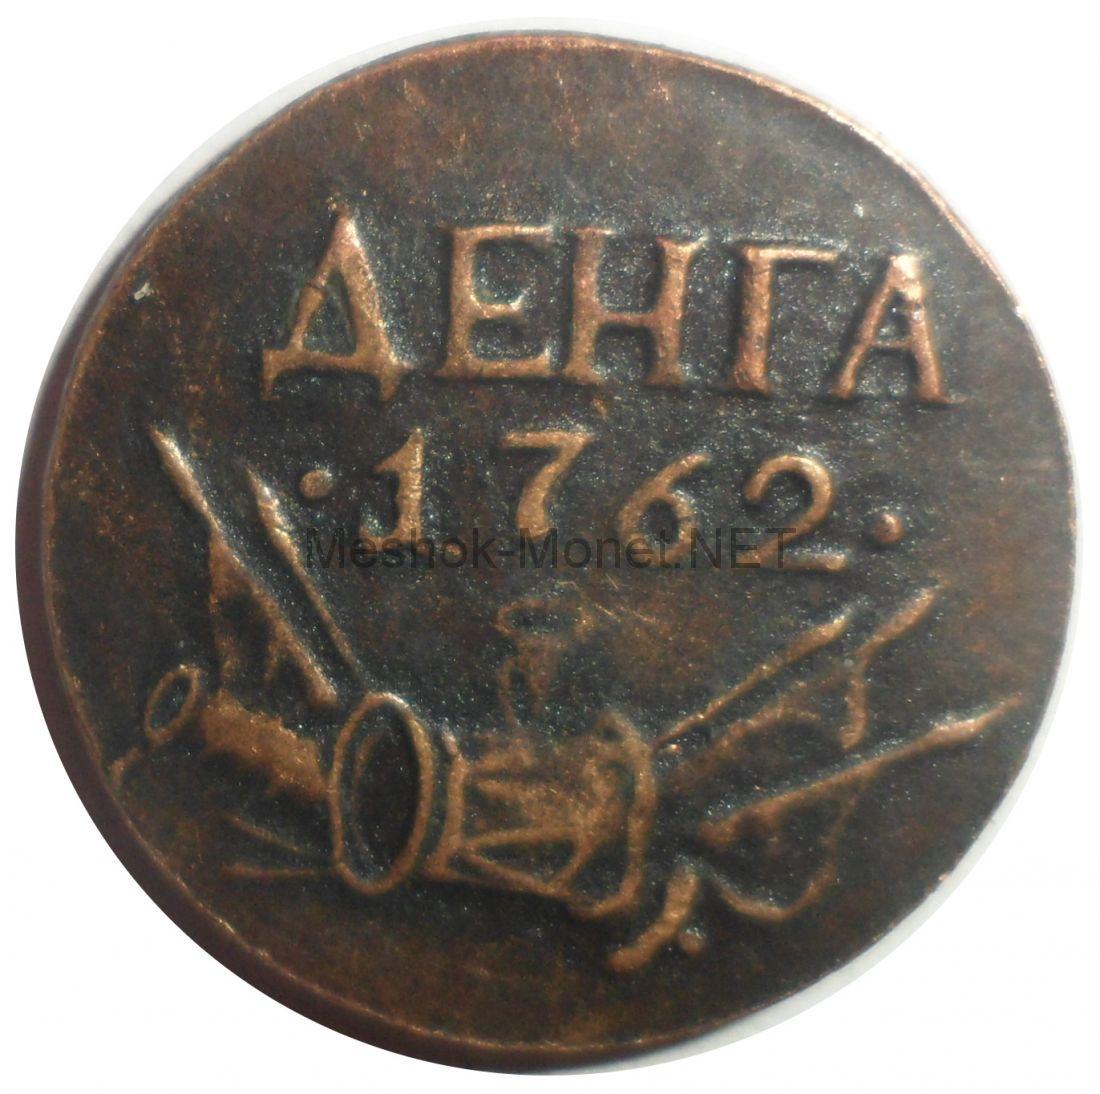 Копия монеты денга 1762 года. Барабаны